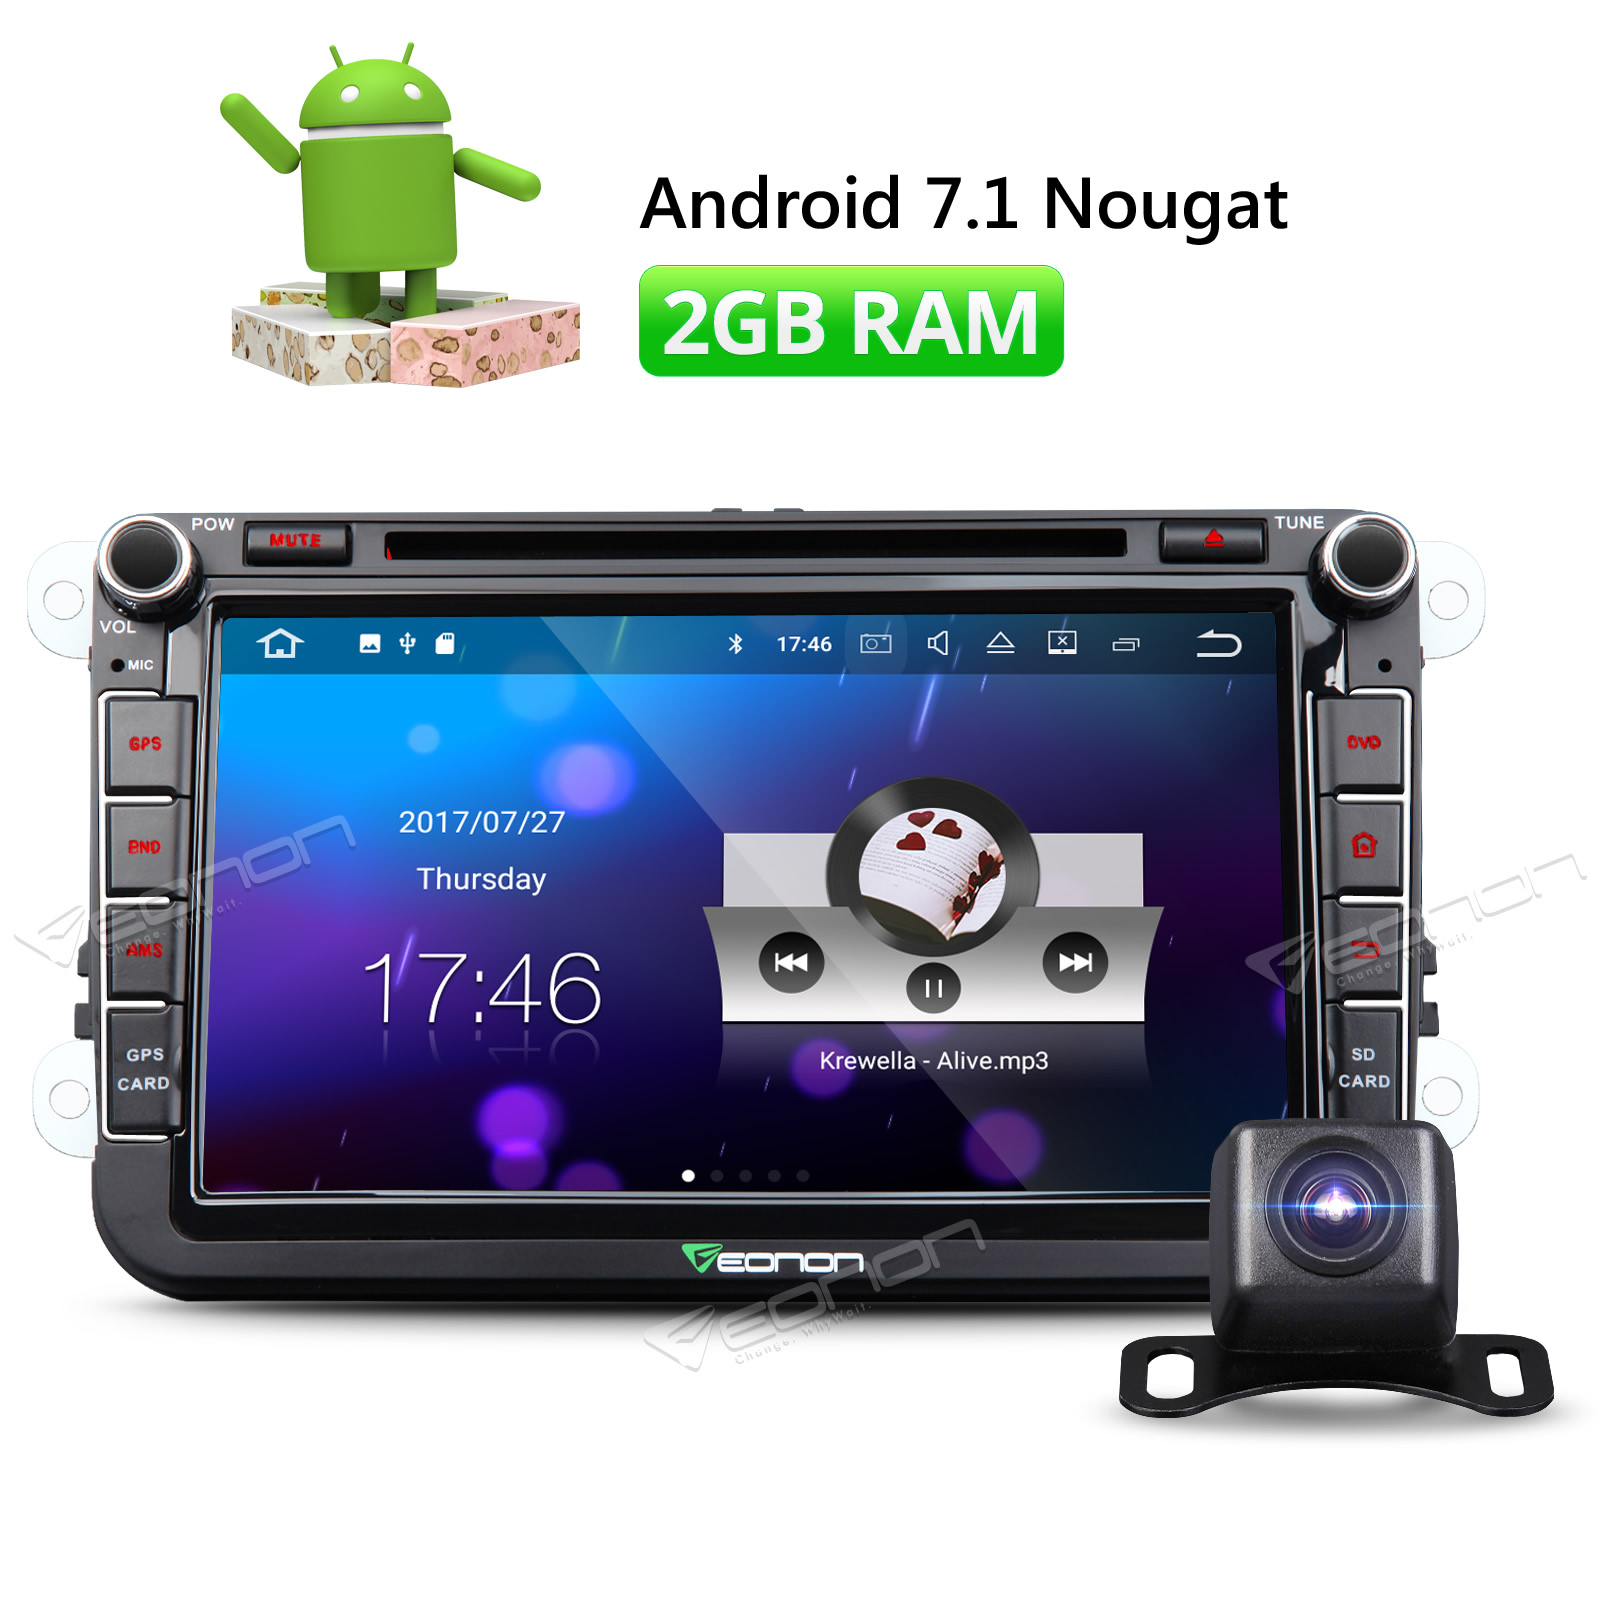 Eonon Android 71 8 Car Dvd Player Gps Navigation For Vw Volkswagen Wiring Diagram Bora Caddy Eos Golf Jetta Lavida New Sharan Camera In Multimedia From